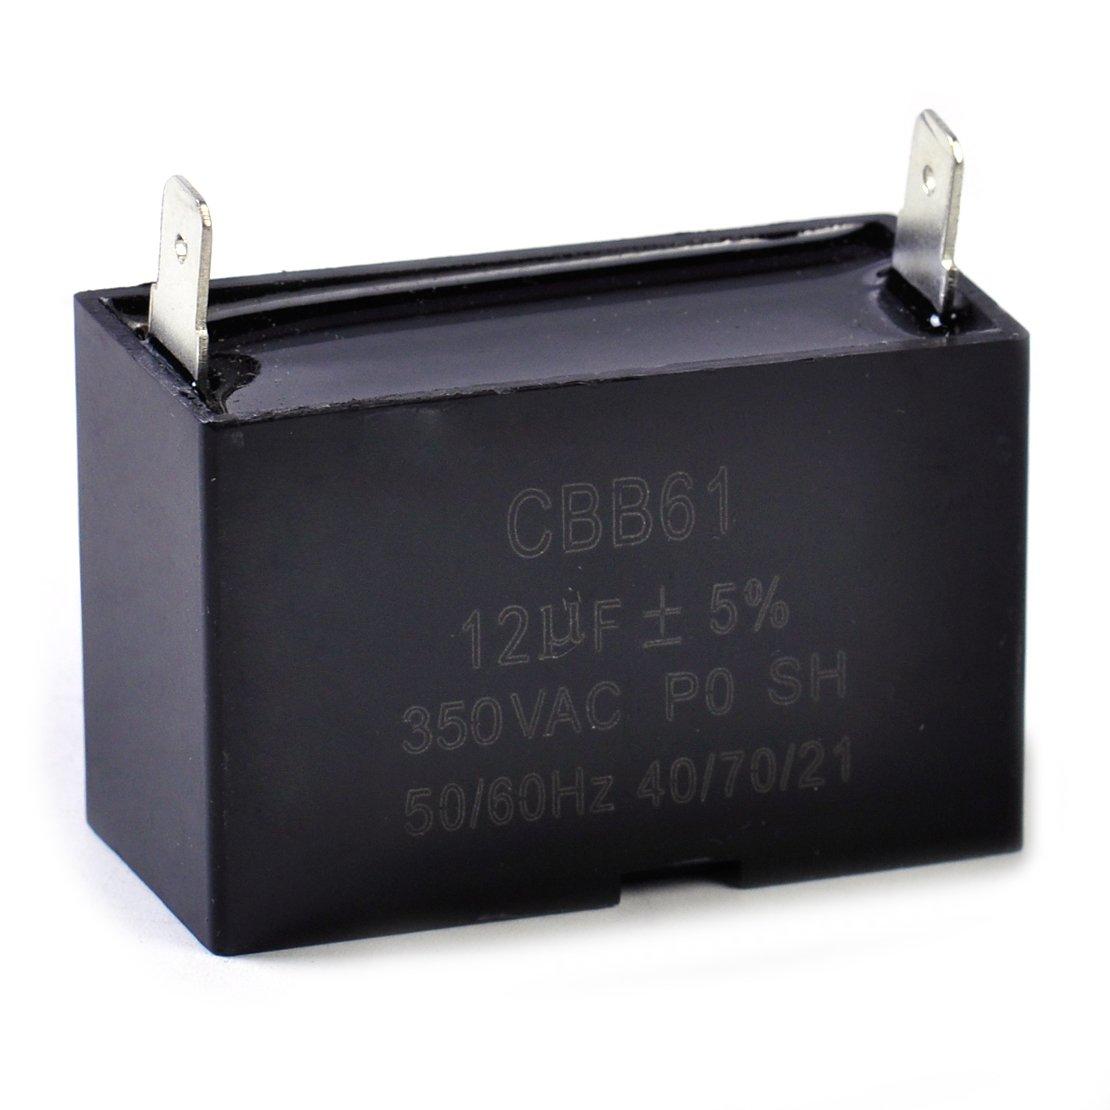 Vendedor cumplido eastar CBB61 12uF Peque/ño generador de Gasolina Capacitor 350 Vac 50 60HZ Motor de Ventilador de Techo